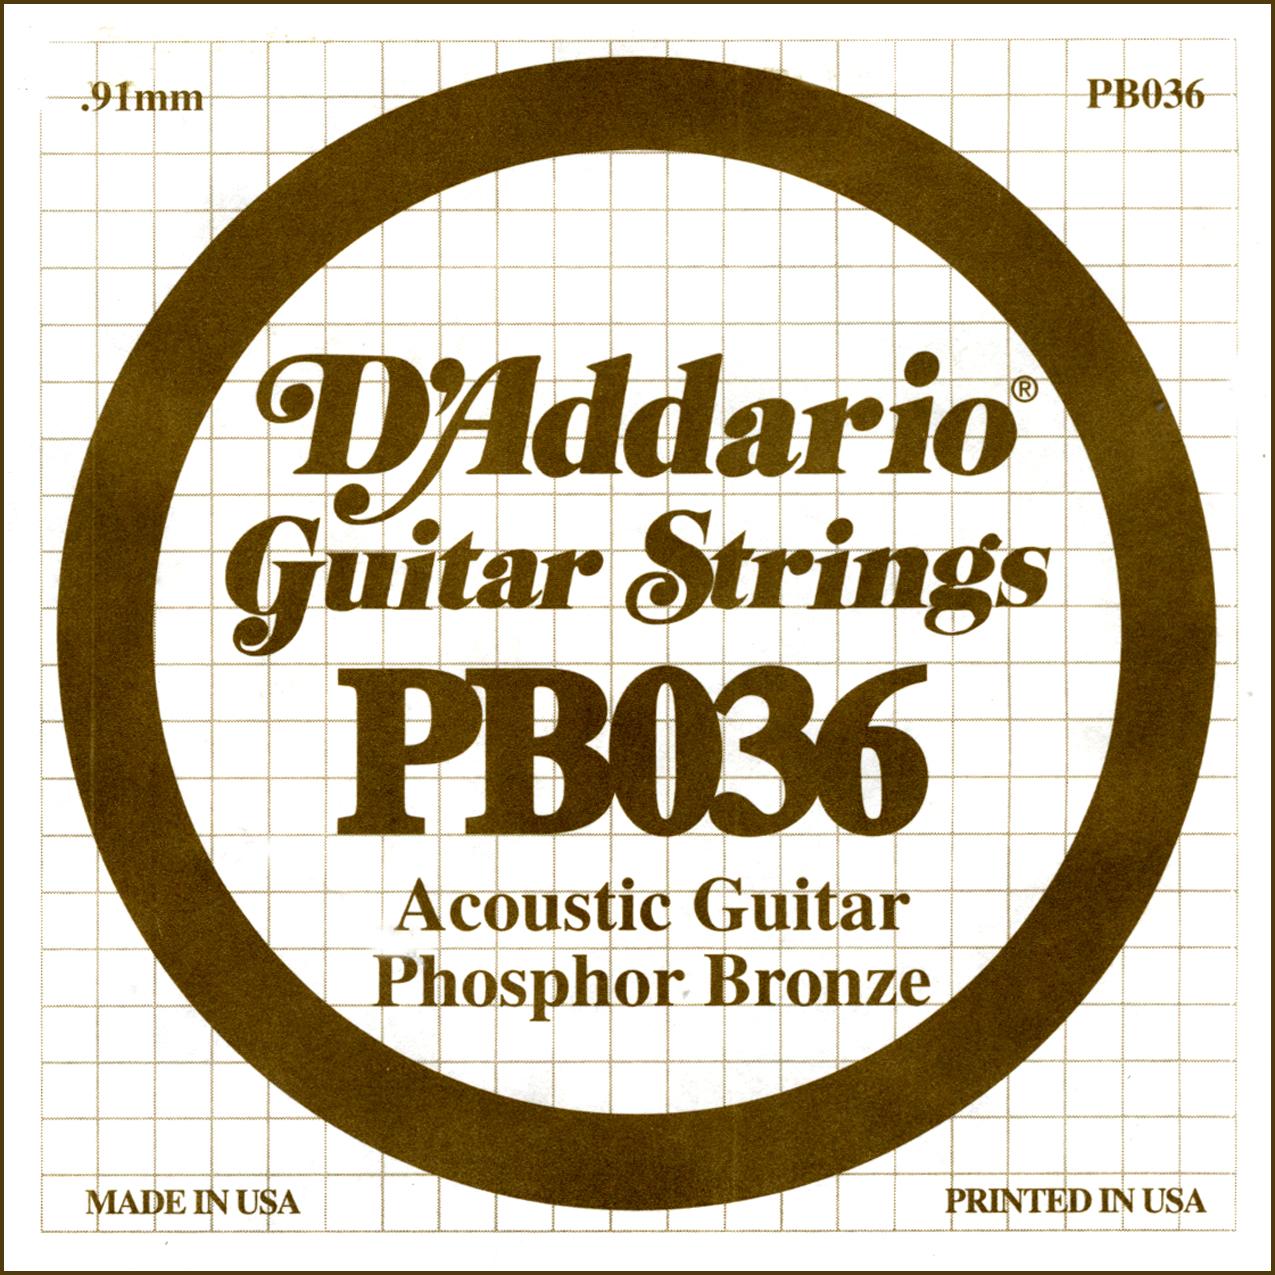 D'Addario Single Strings PBO36